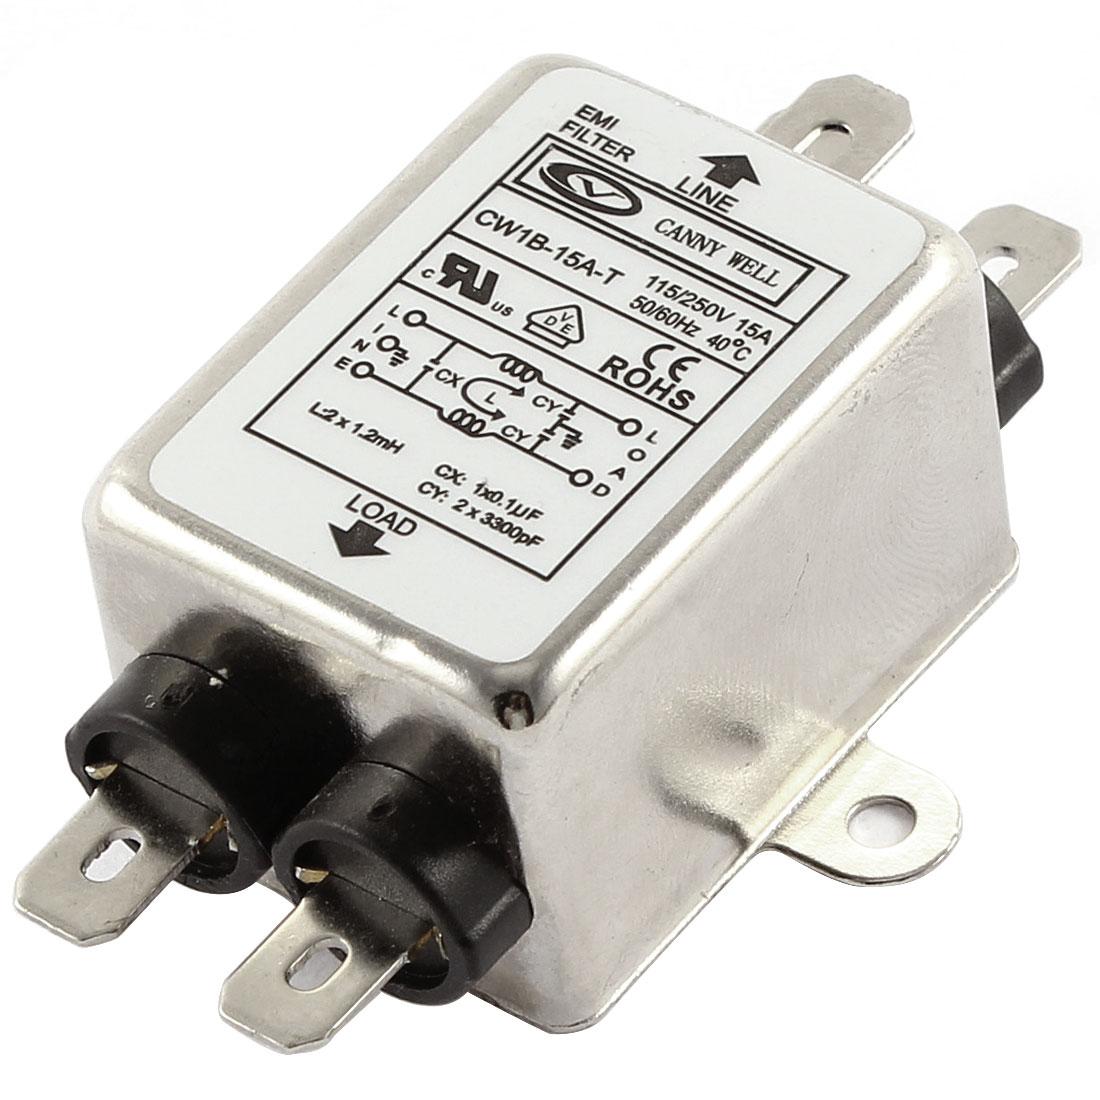 AC 115/250V 15A CW1B-15A-T Noise Suppressor Power EMI Filter